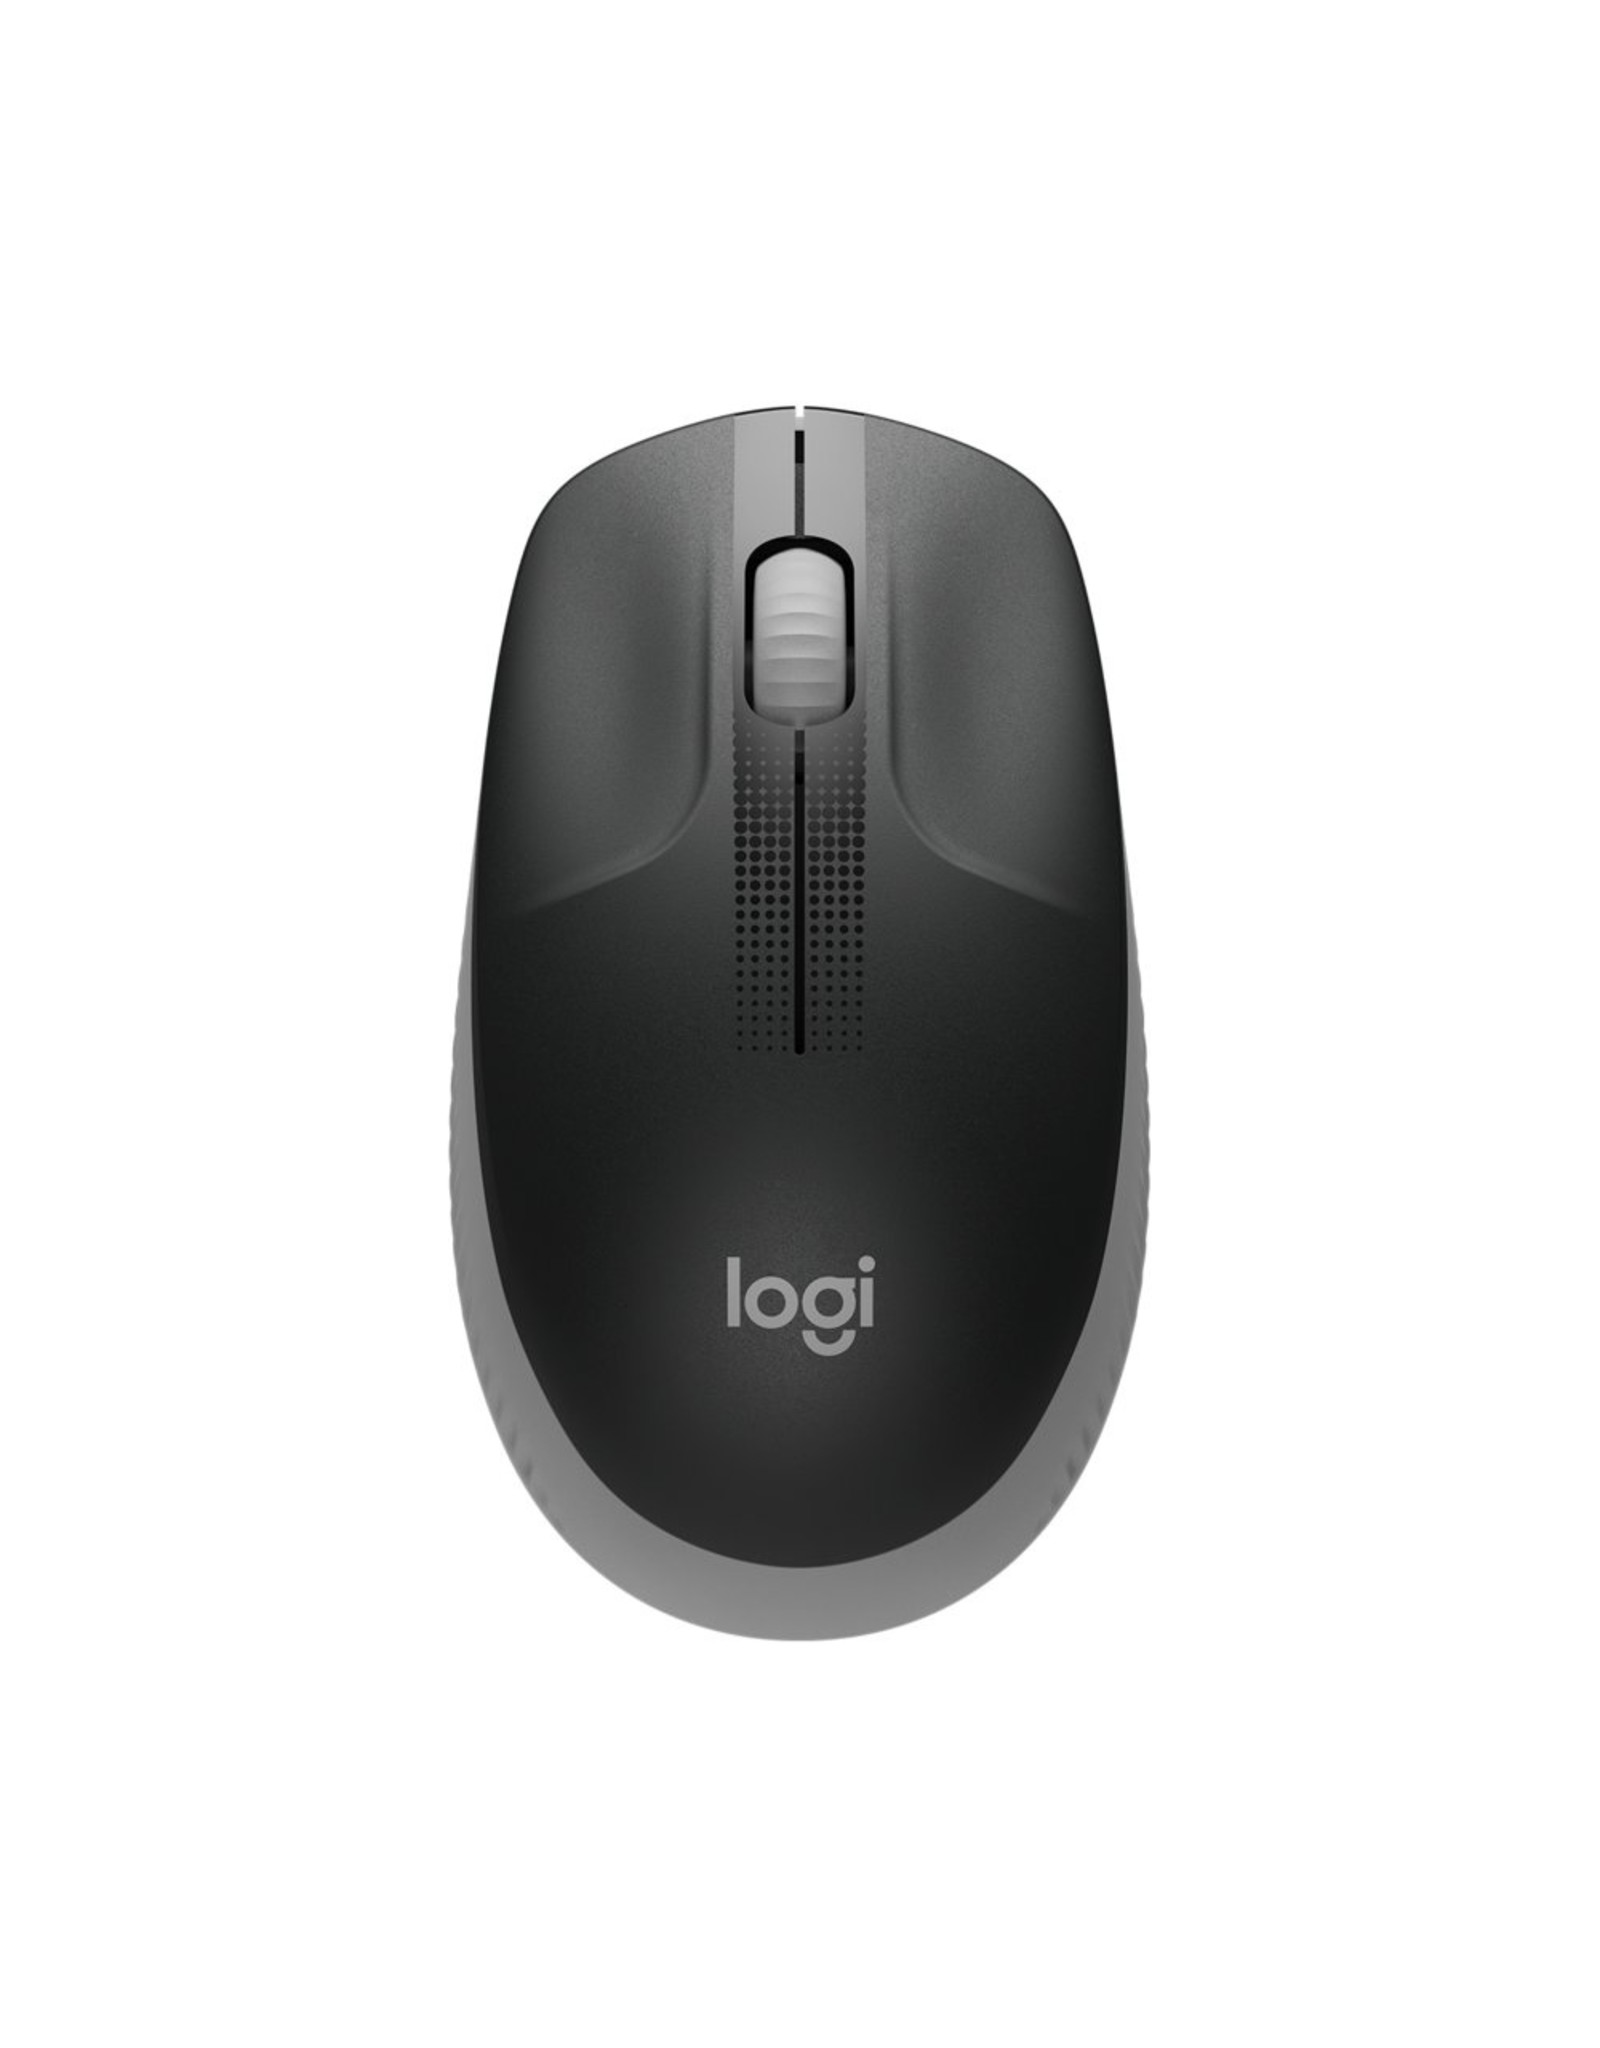 Logitech M190 wireless mouse Grey